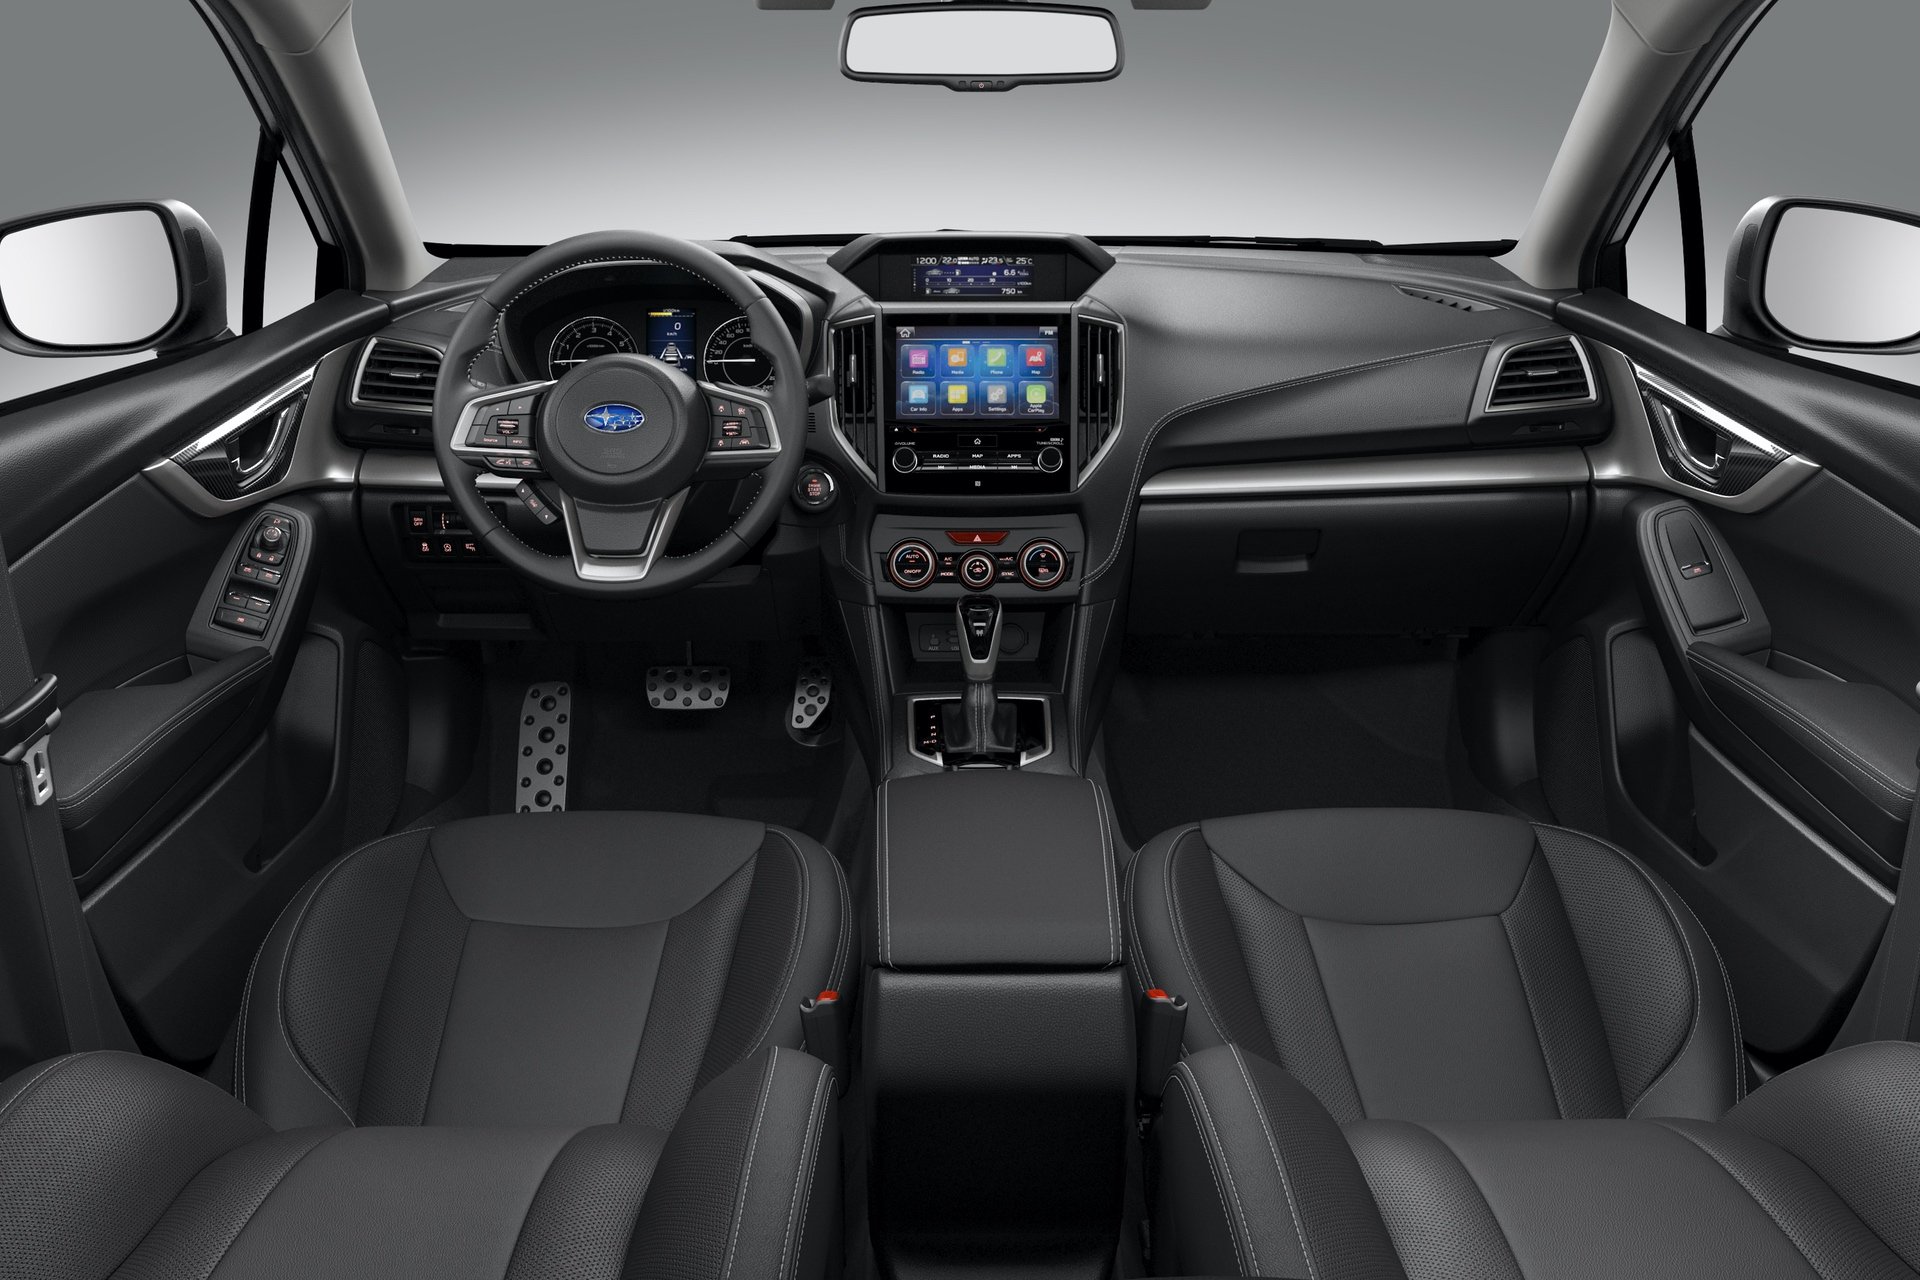 First_Drive_Subaru_Impreza_0014